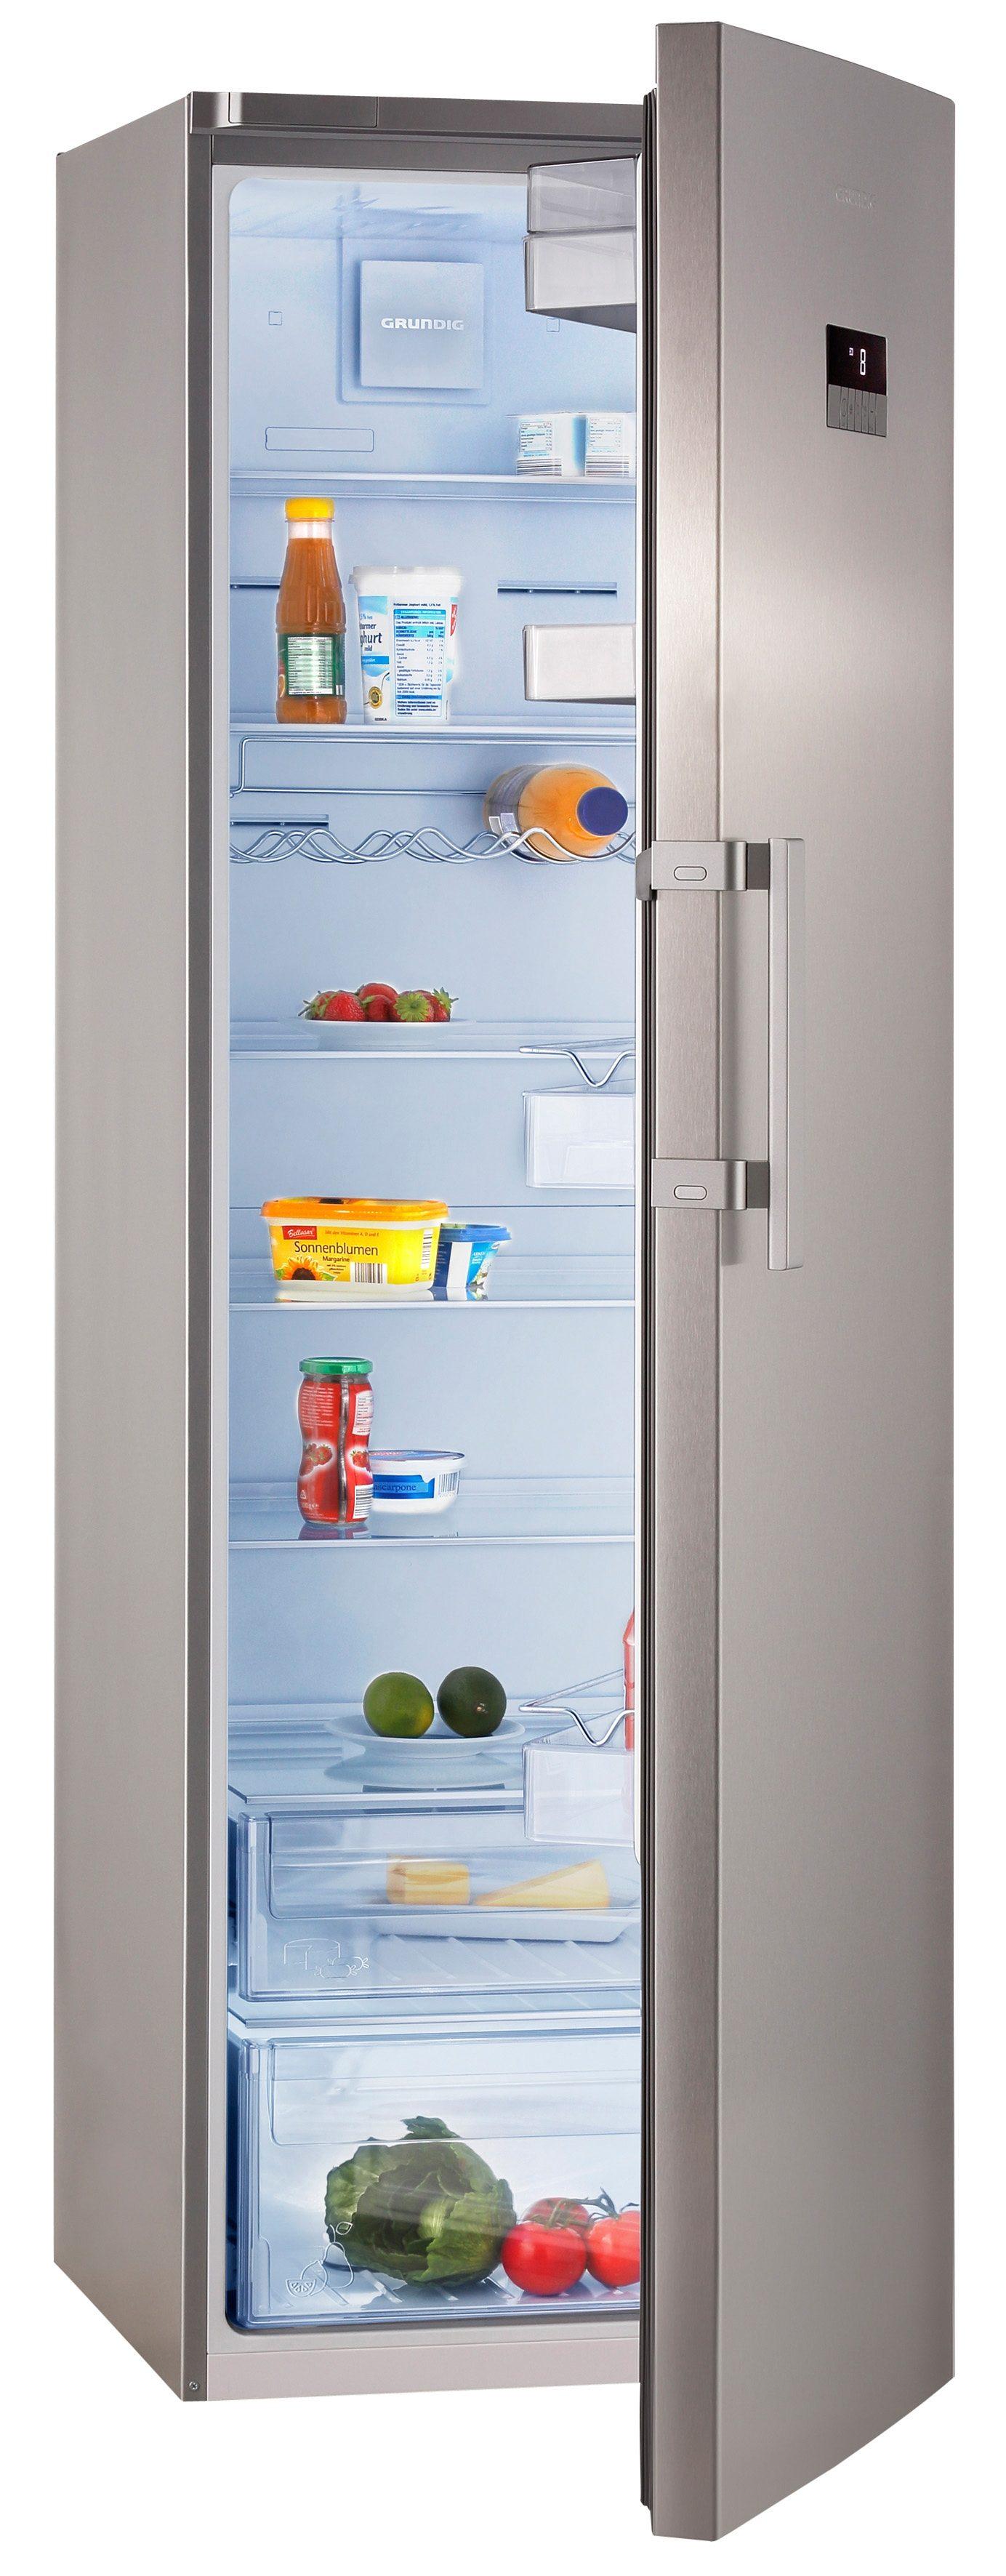 Grundig Kühlschrank GSN 10720 X, A++, 185 cm hoch